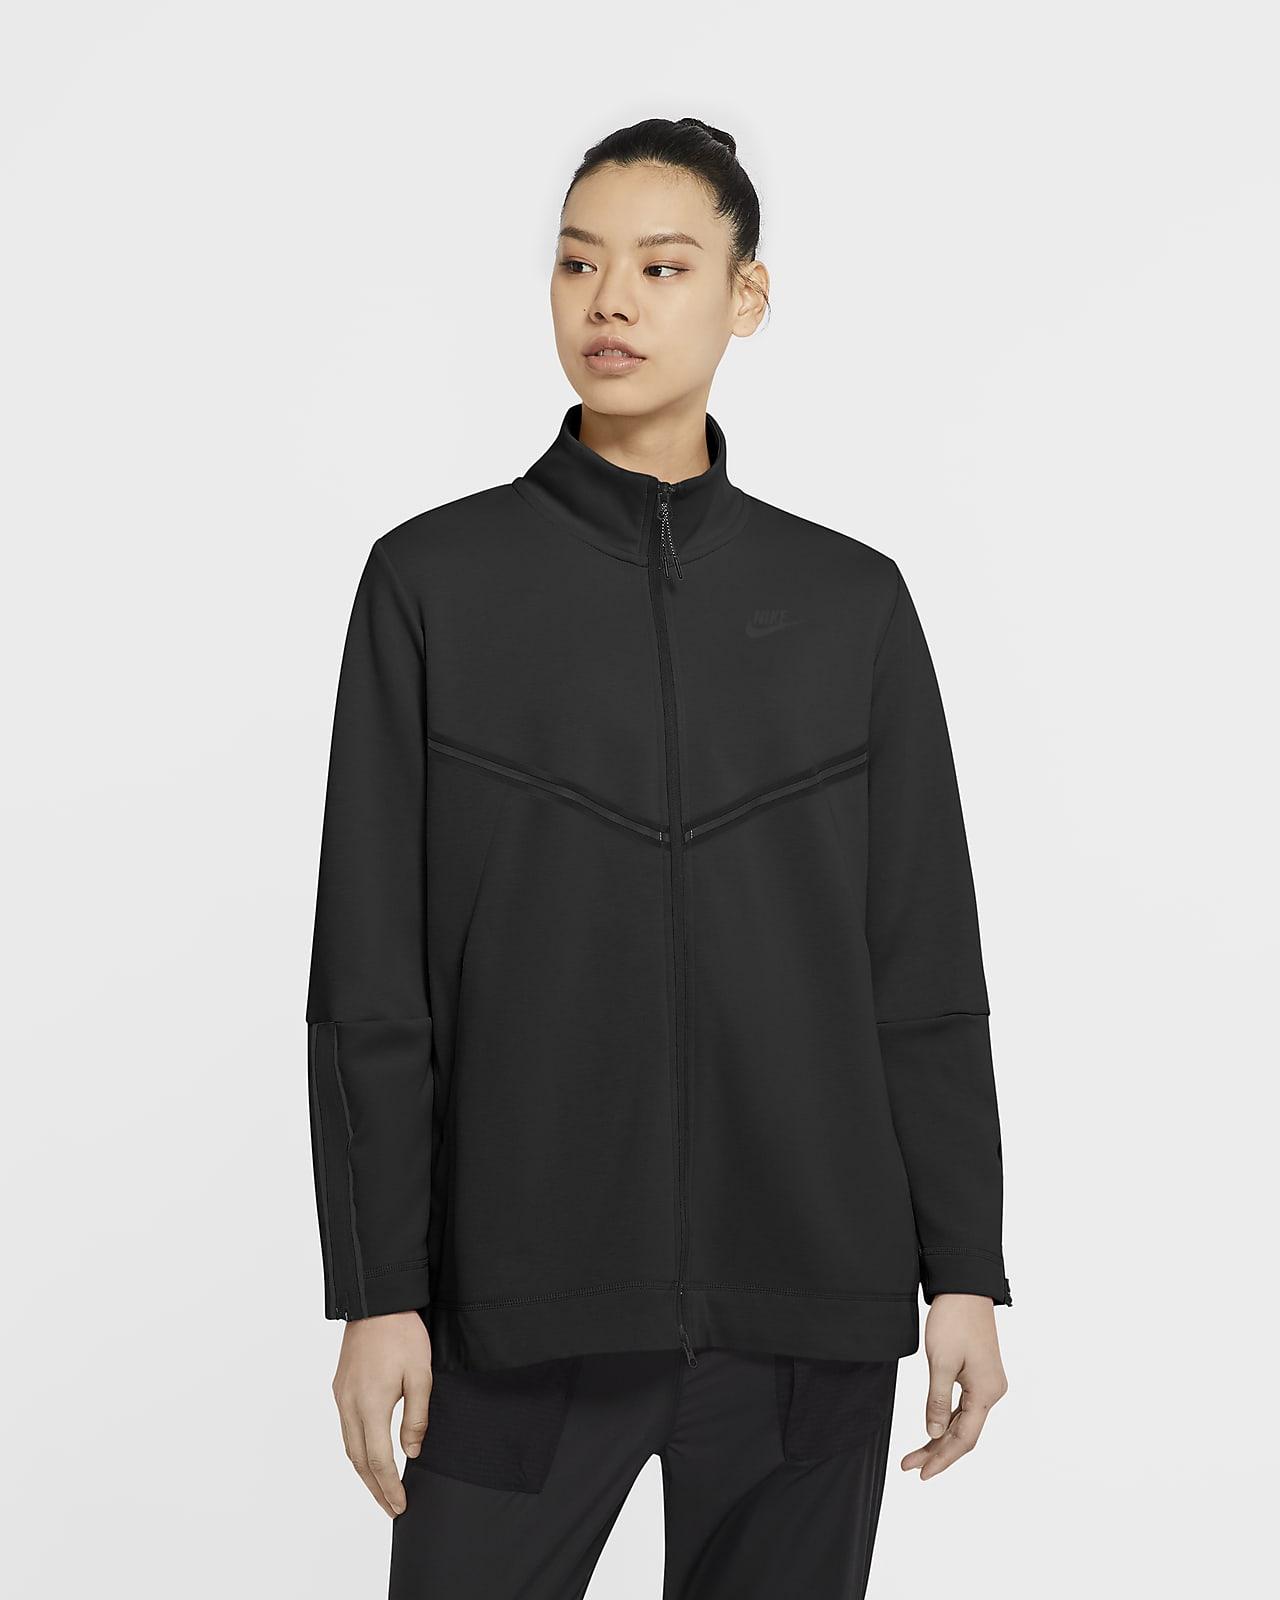 Nike Sportswear Tech Fleece Màniga llarga amb cremallera completa - Dona